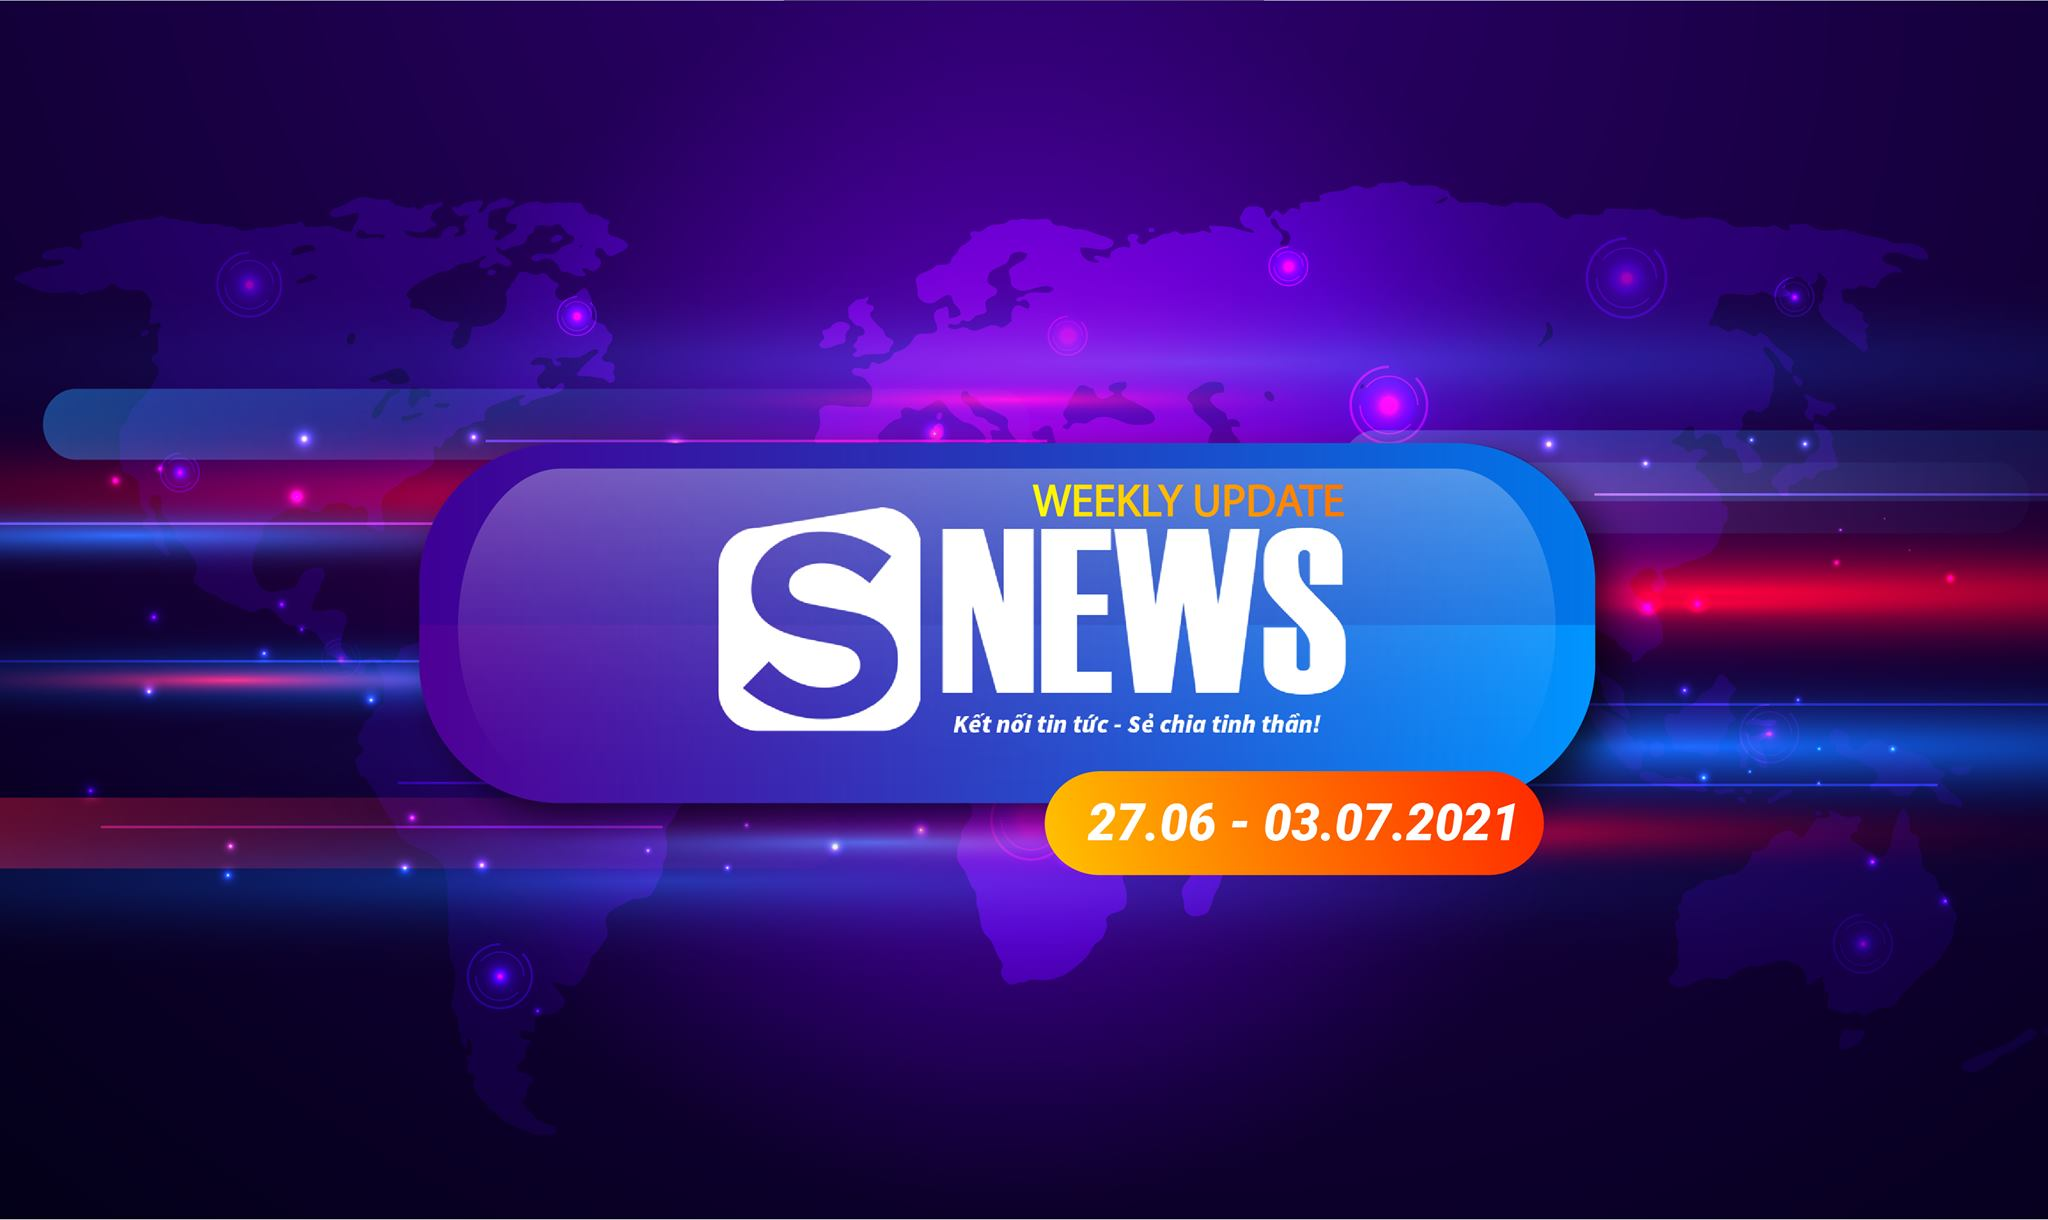 Tổng hợp tin tức Sapo tuần qua: 27.06 - 03.07.2021